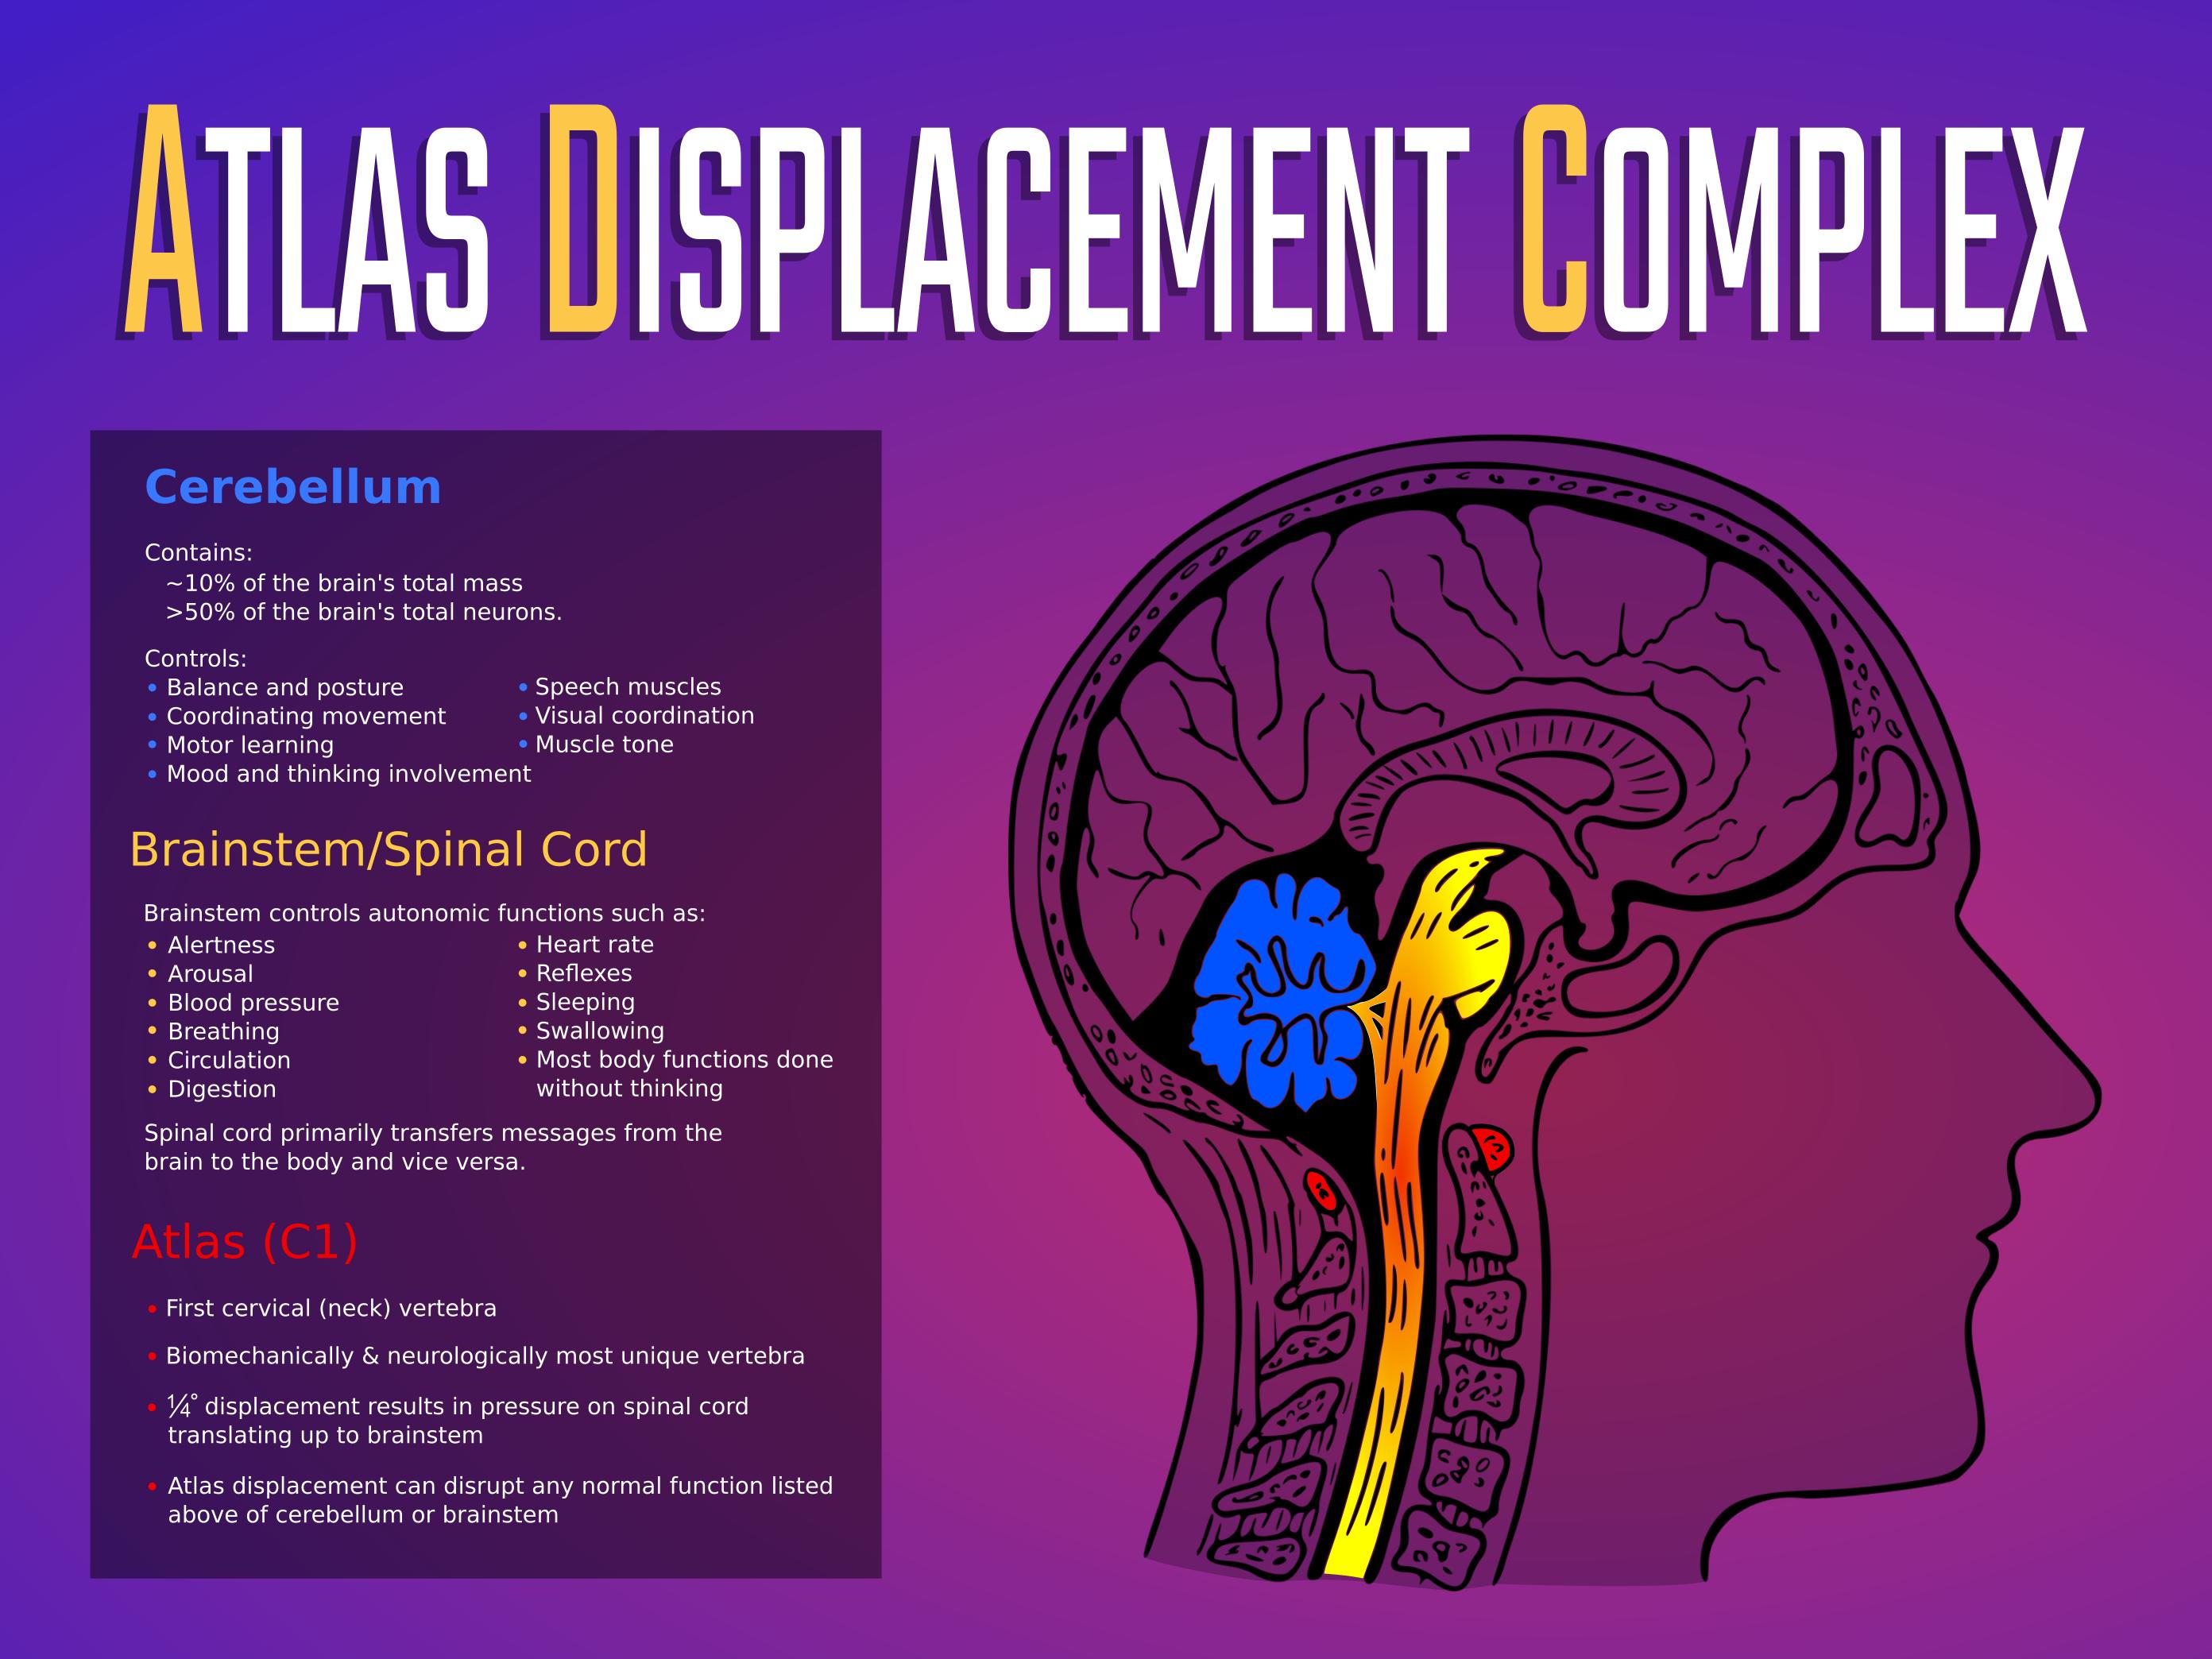 Atlas Upper Cervical Misalignment